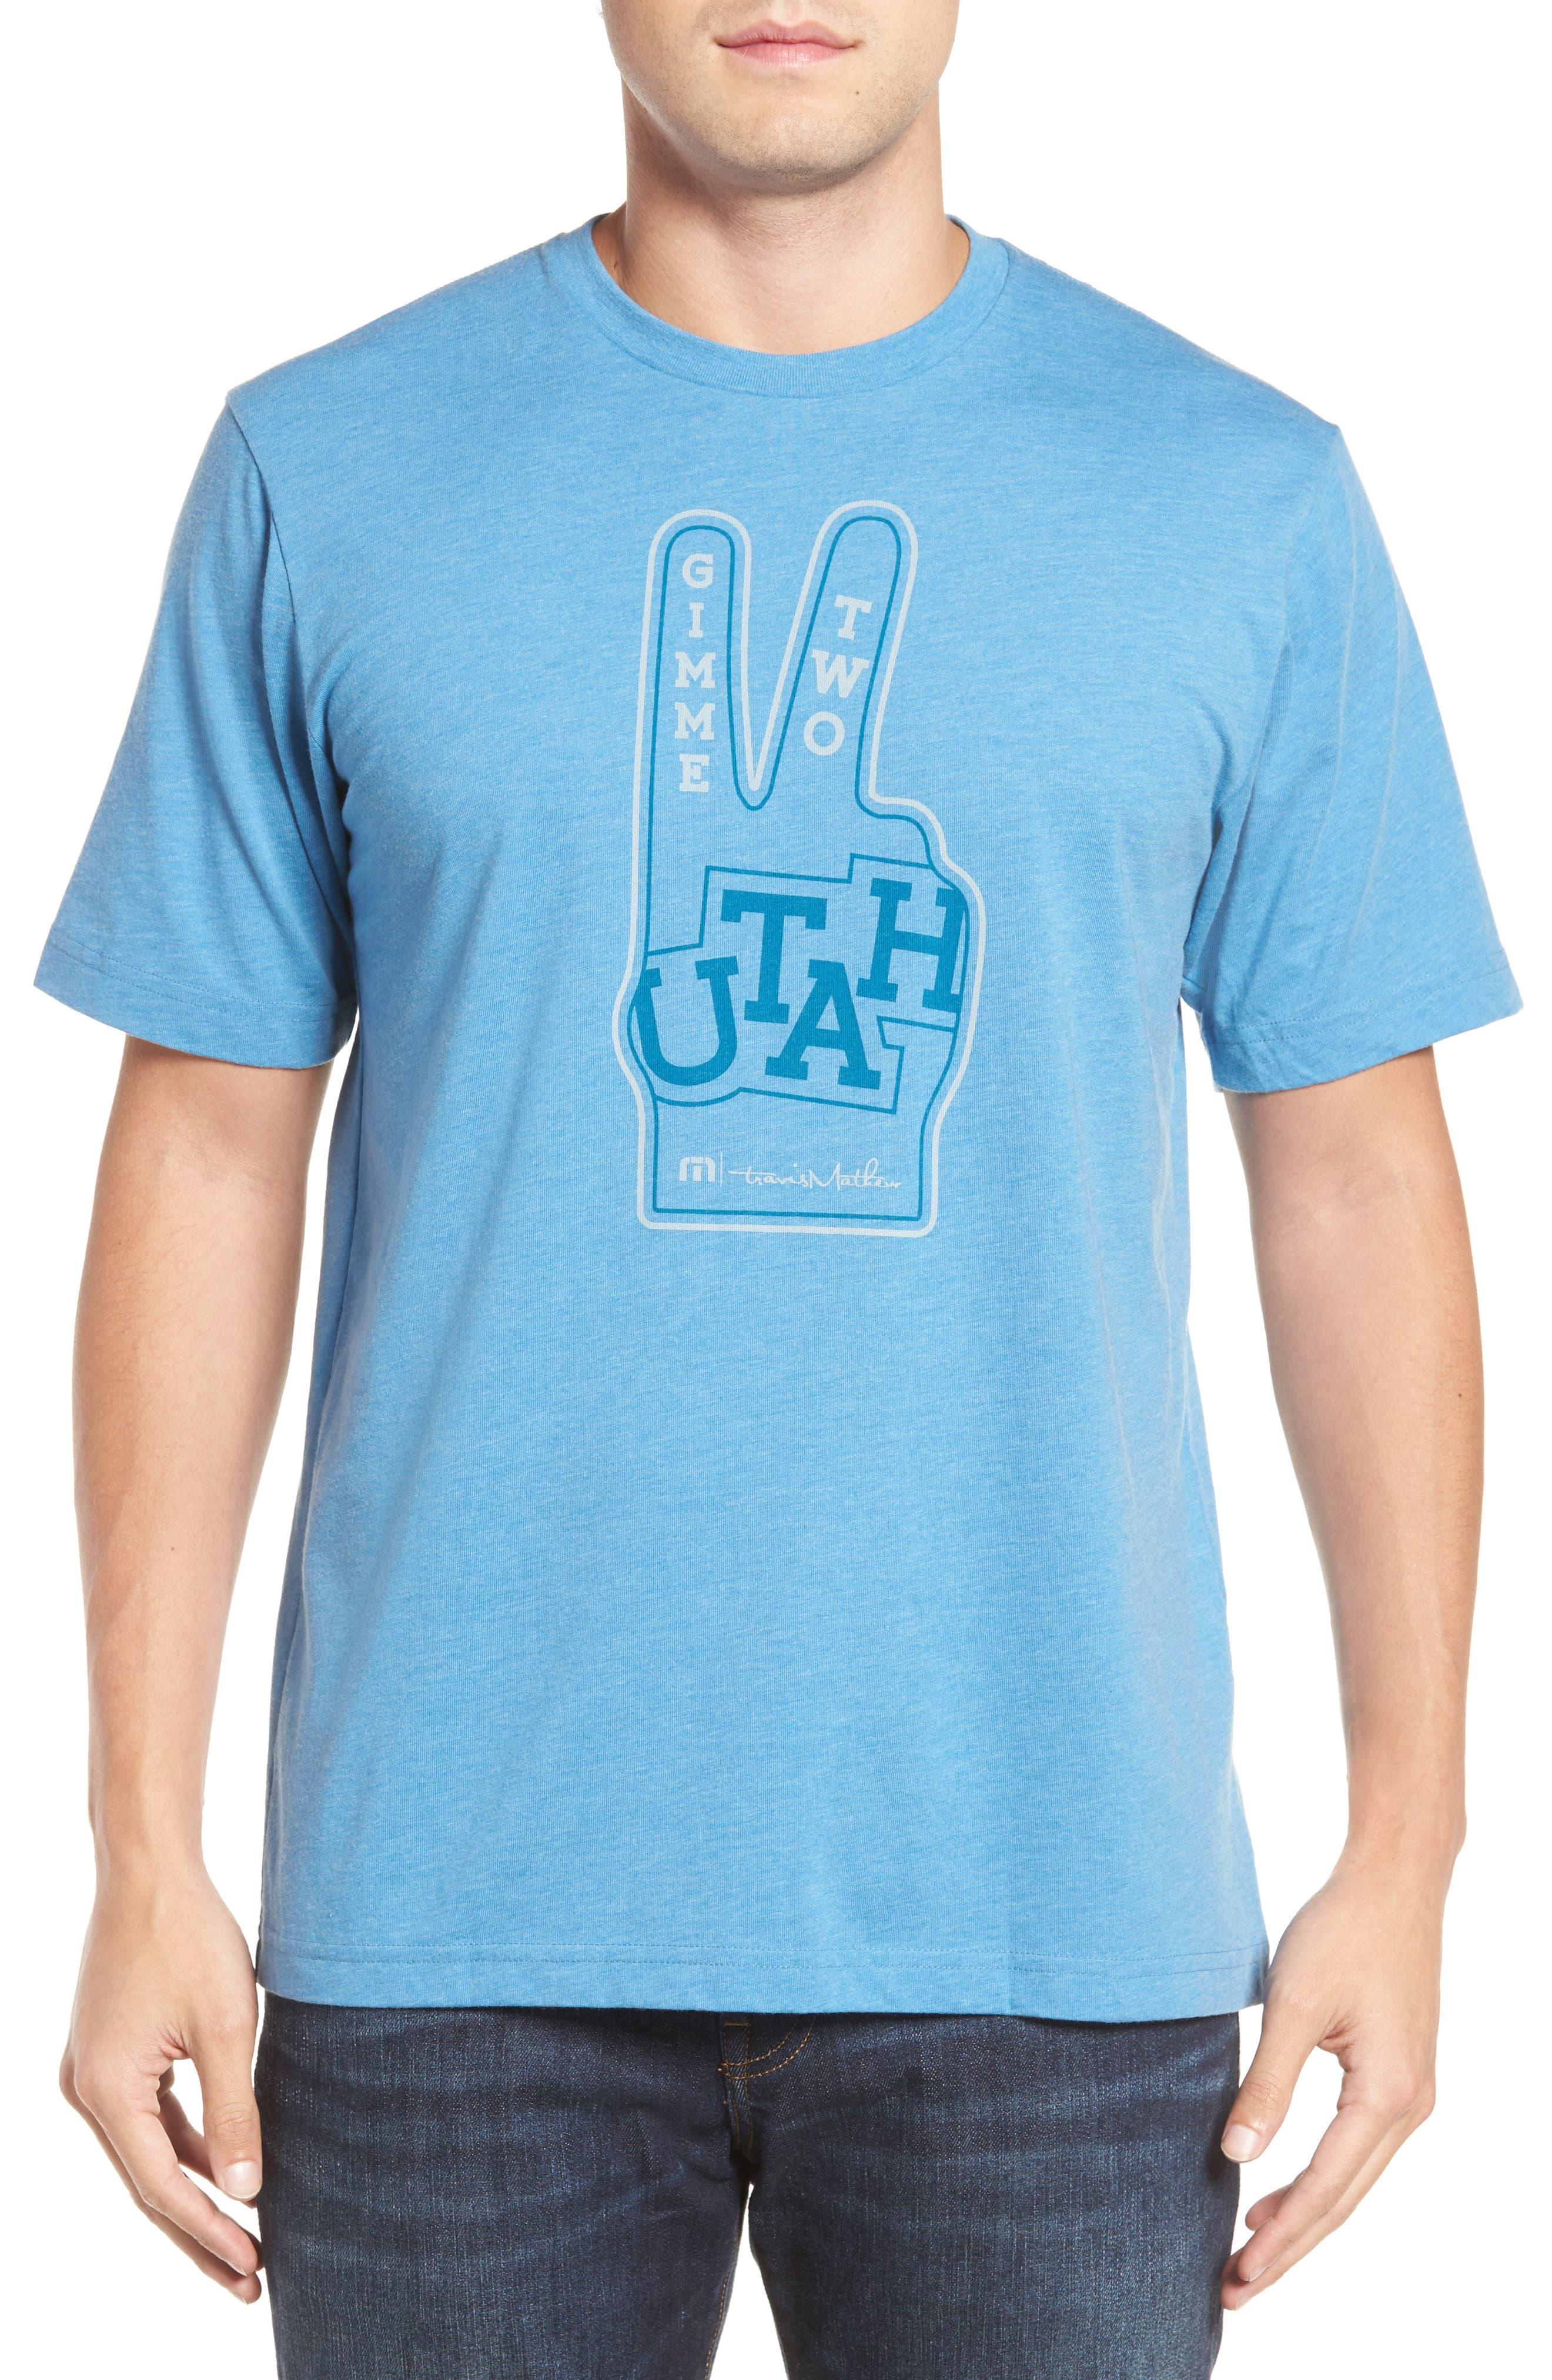 Alternate Image 1 Selected - Travis Mathew Utah T-Shirt